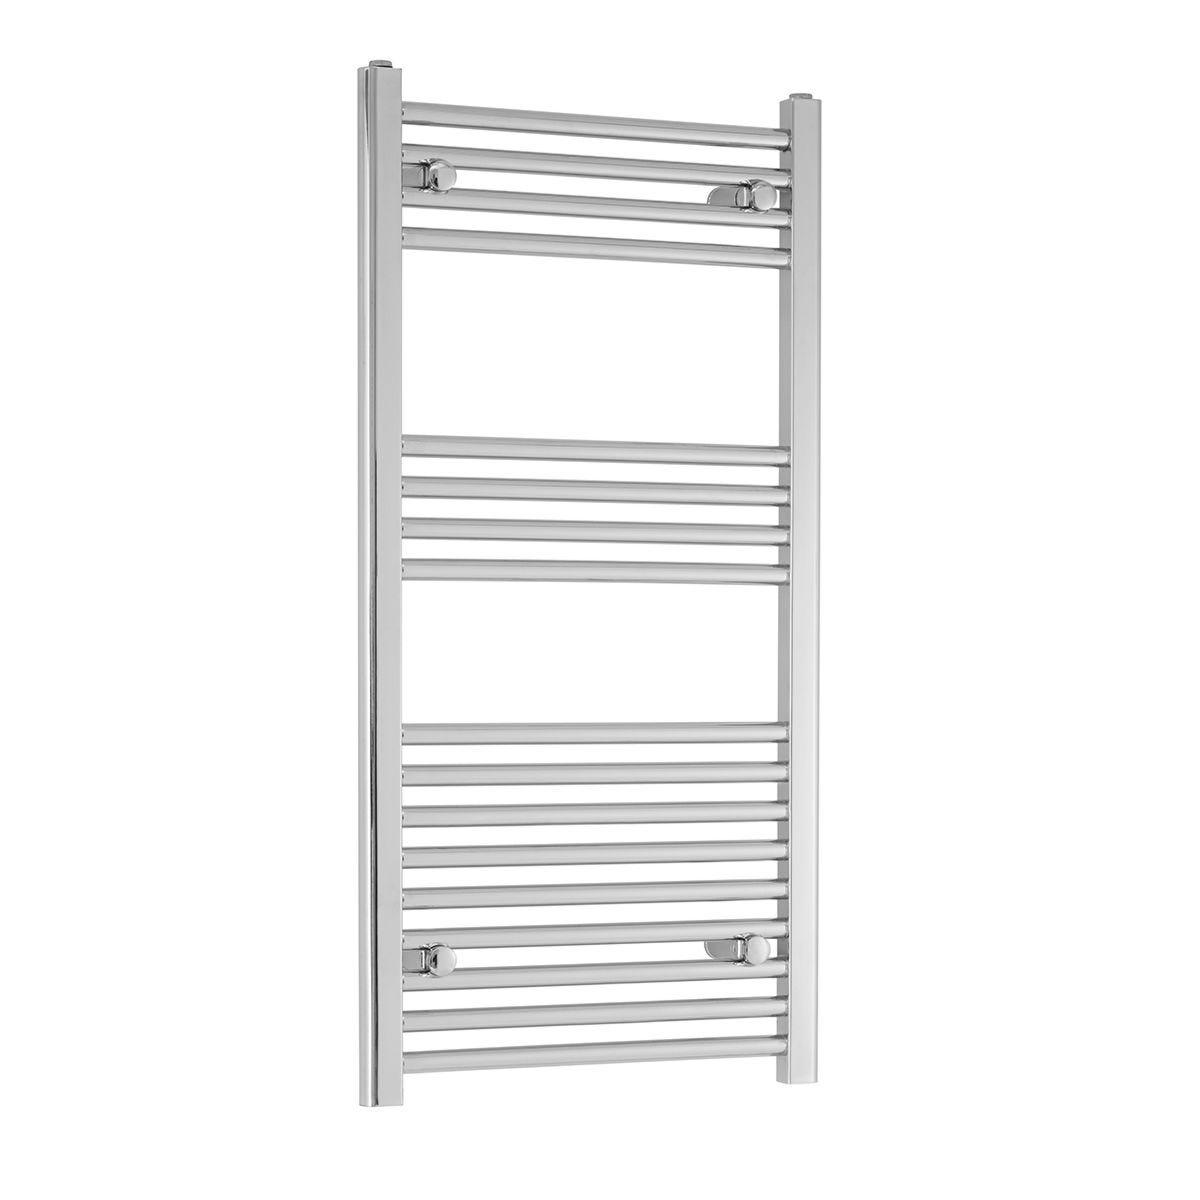 Heating Style Blythe Ladder Rail 800x400mm Straight - Chrome